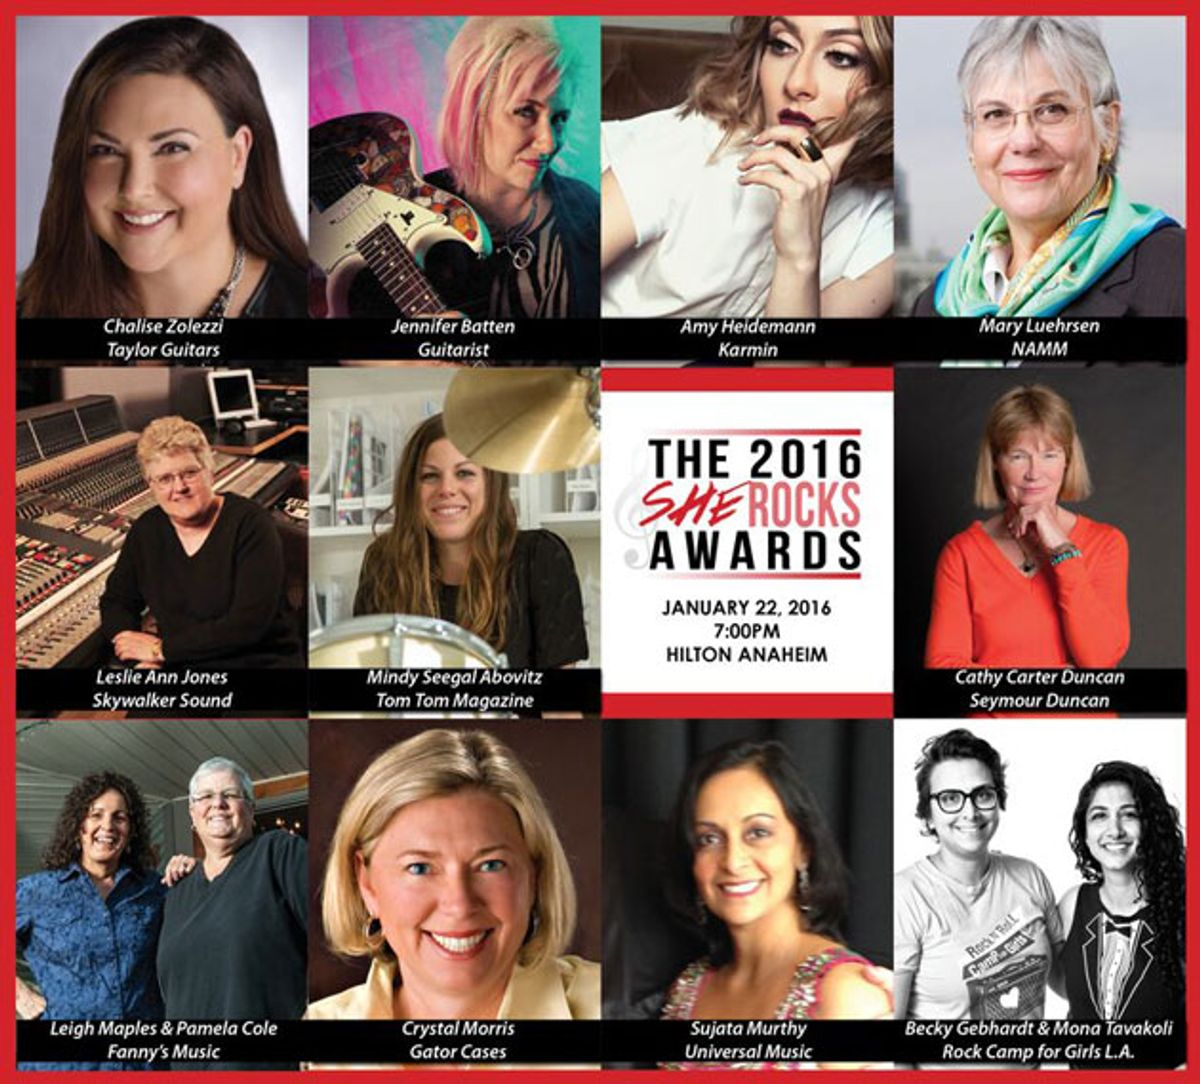 The Women's International Music Network Announces the 2016 She Rocks Award Recipients